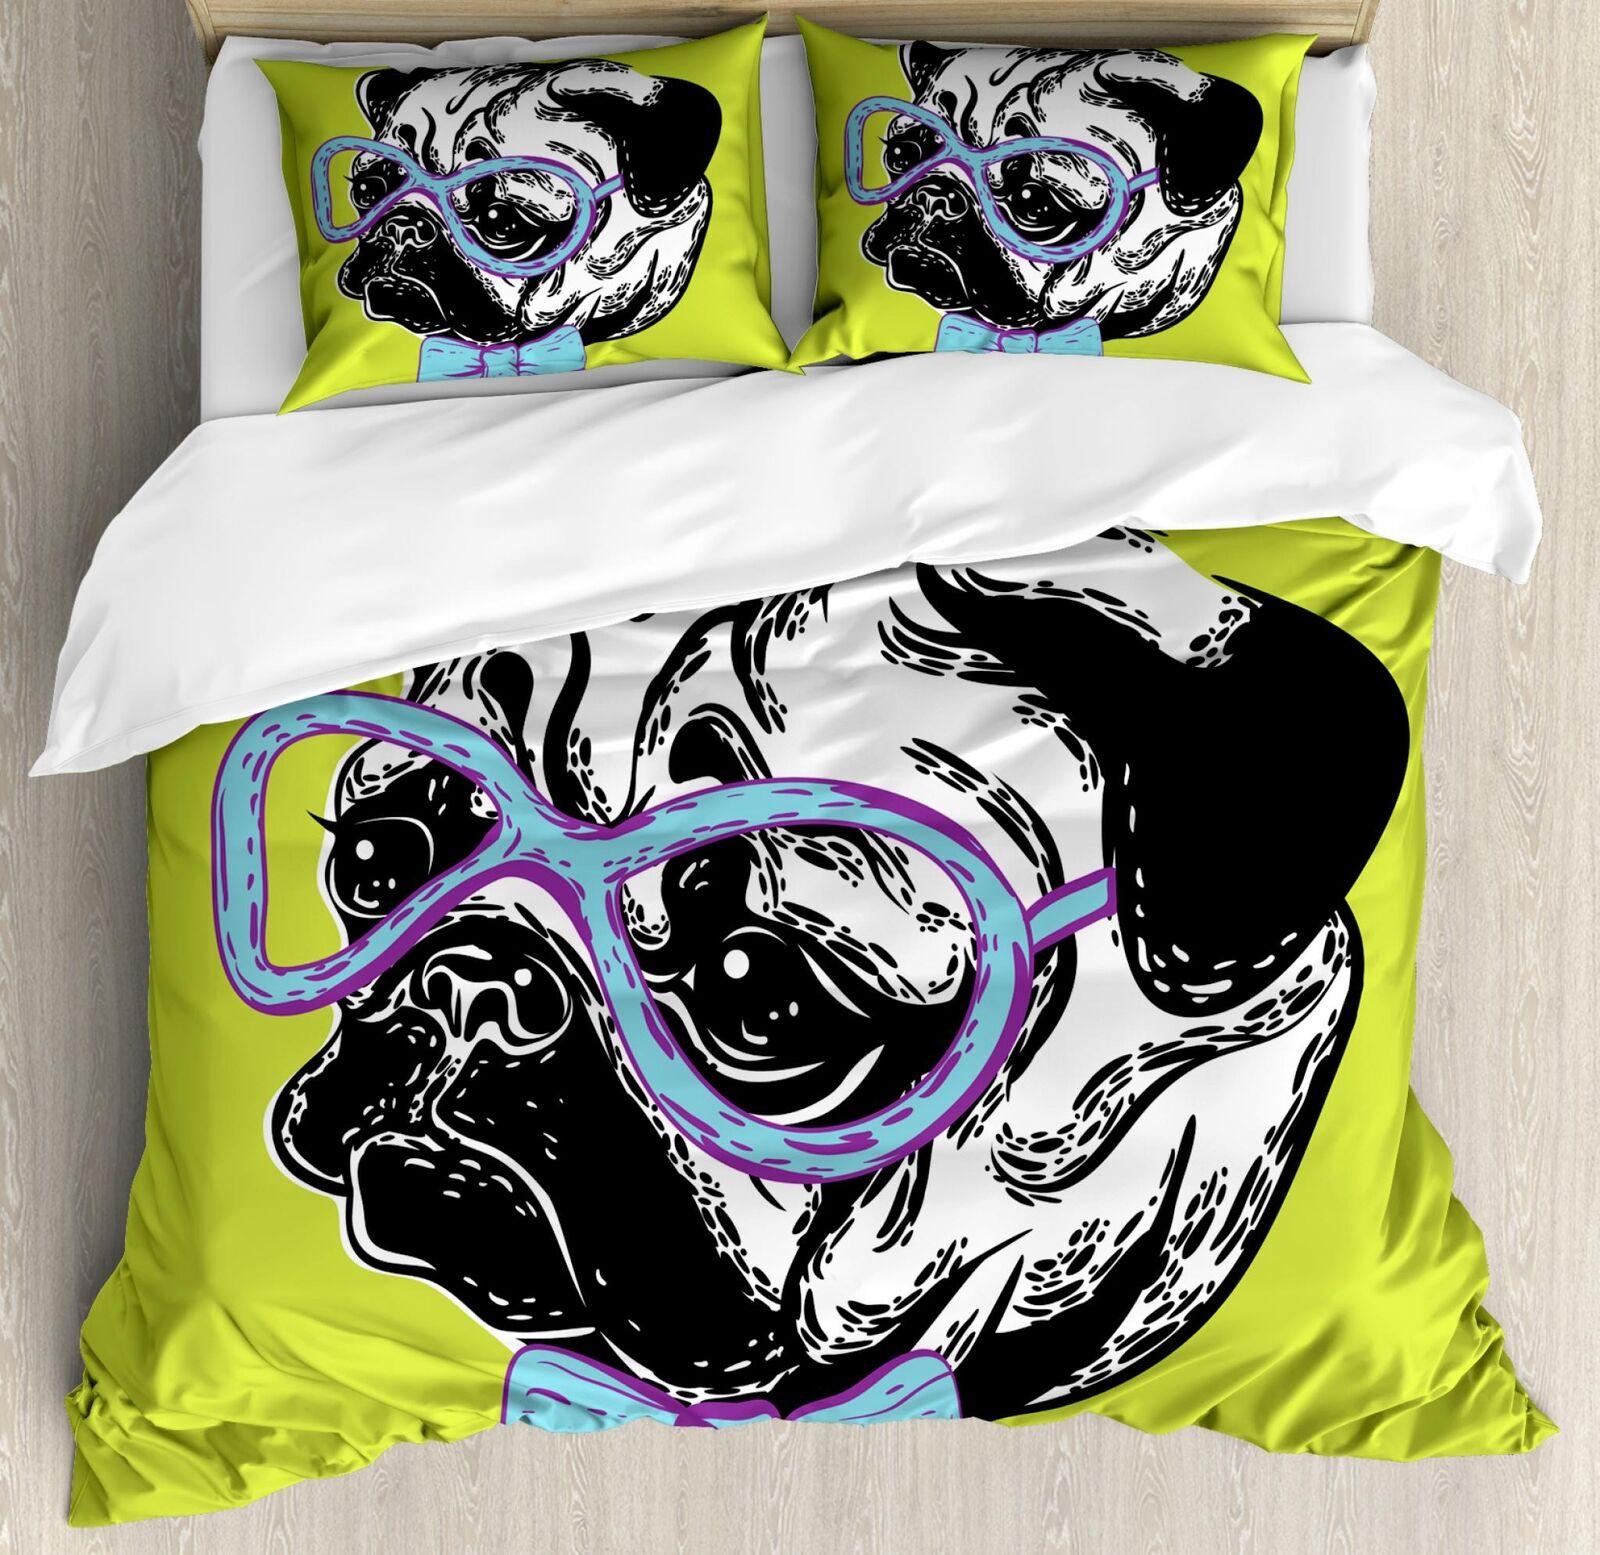 Pug Duvet Cover Set Twin Queen King Größes with Pillow Shams Bedding